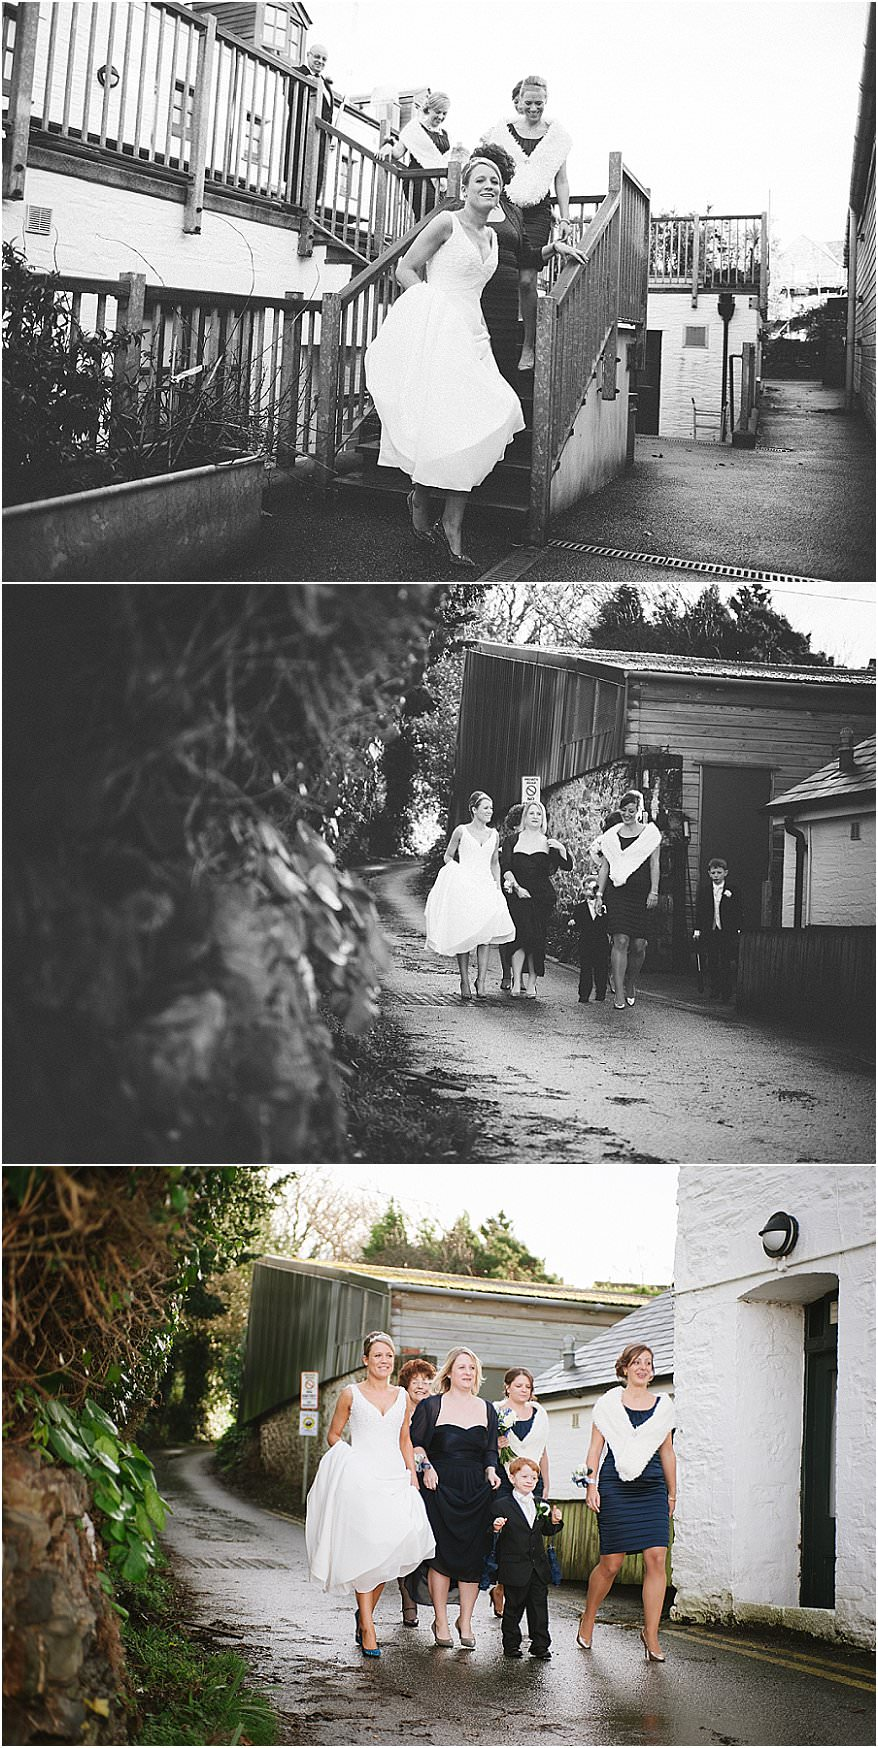 wedding at pendennis castle 21 wedding photographer cornwall